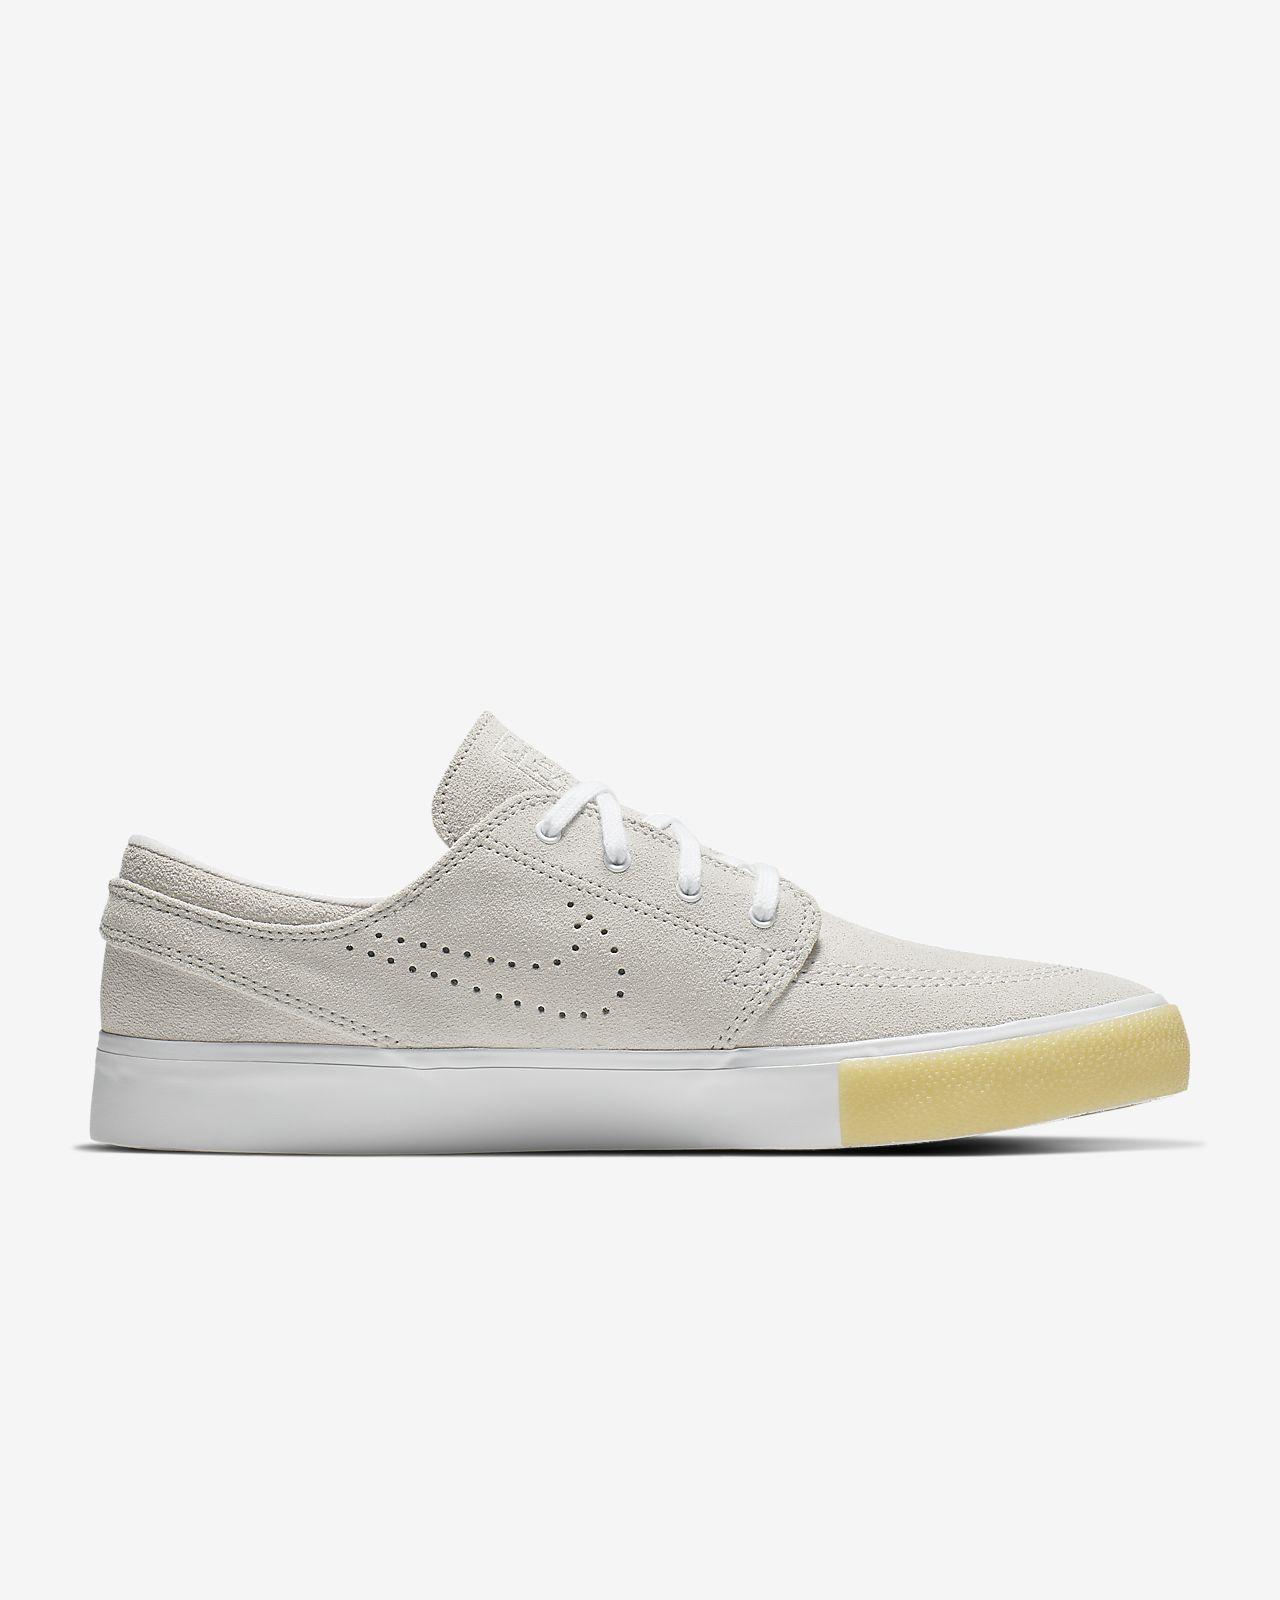 Nike SB Zoom Stefan Janoski: Mid Grey | Nike sb shoes, Nike